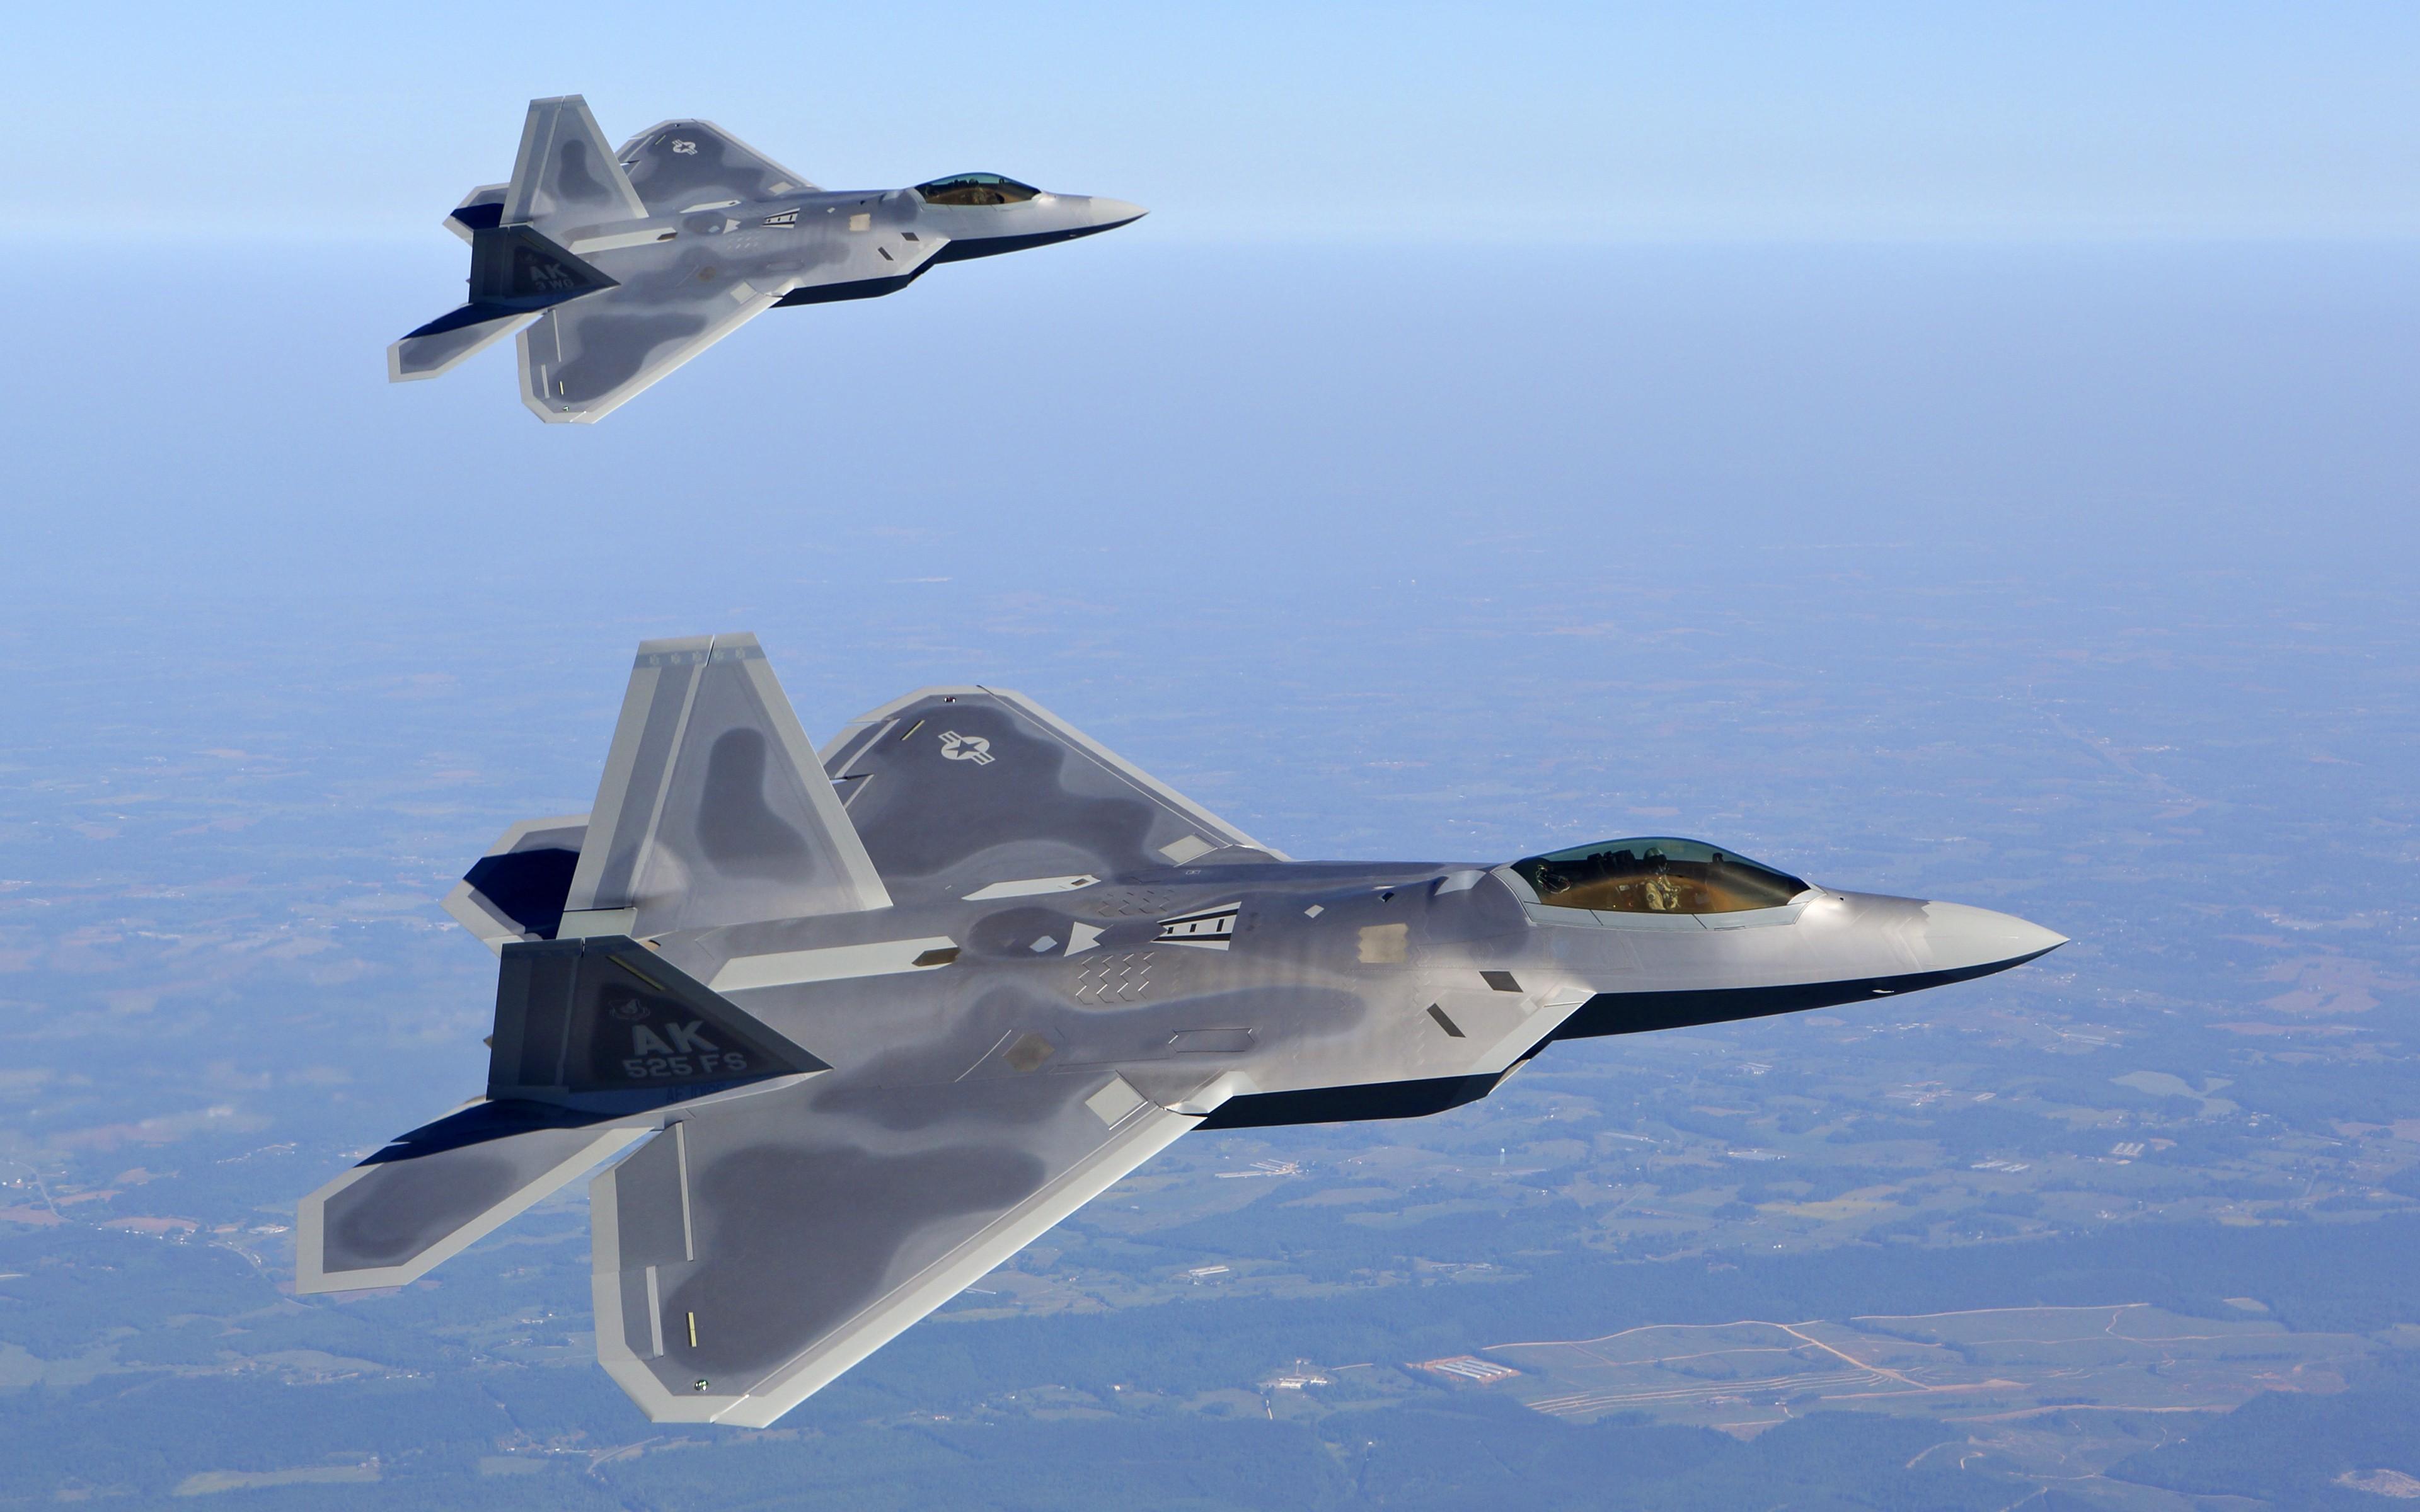 Aereo Da Caccia F 22 Raptor : Sfondi veicolo aereo aerei militari f raptor